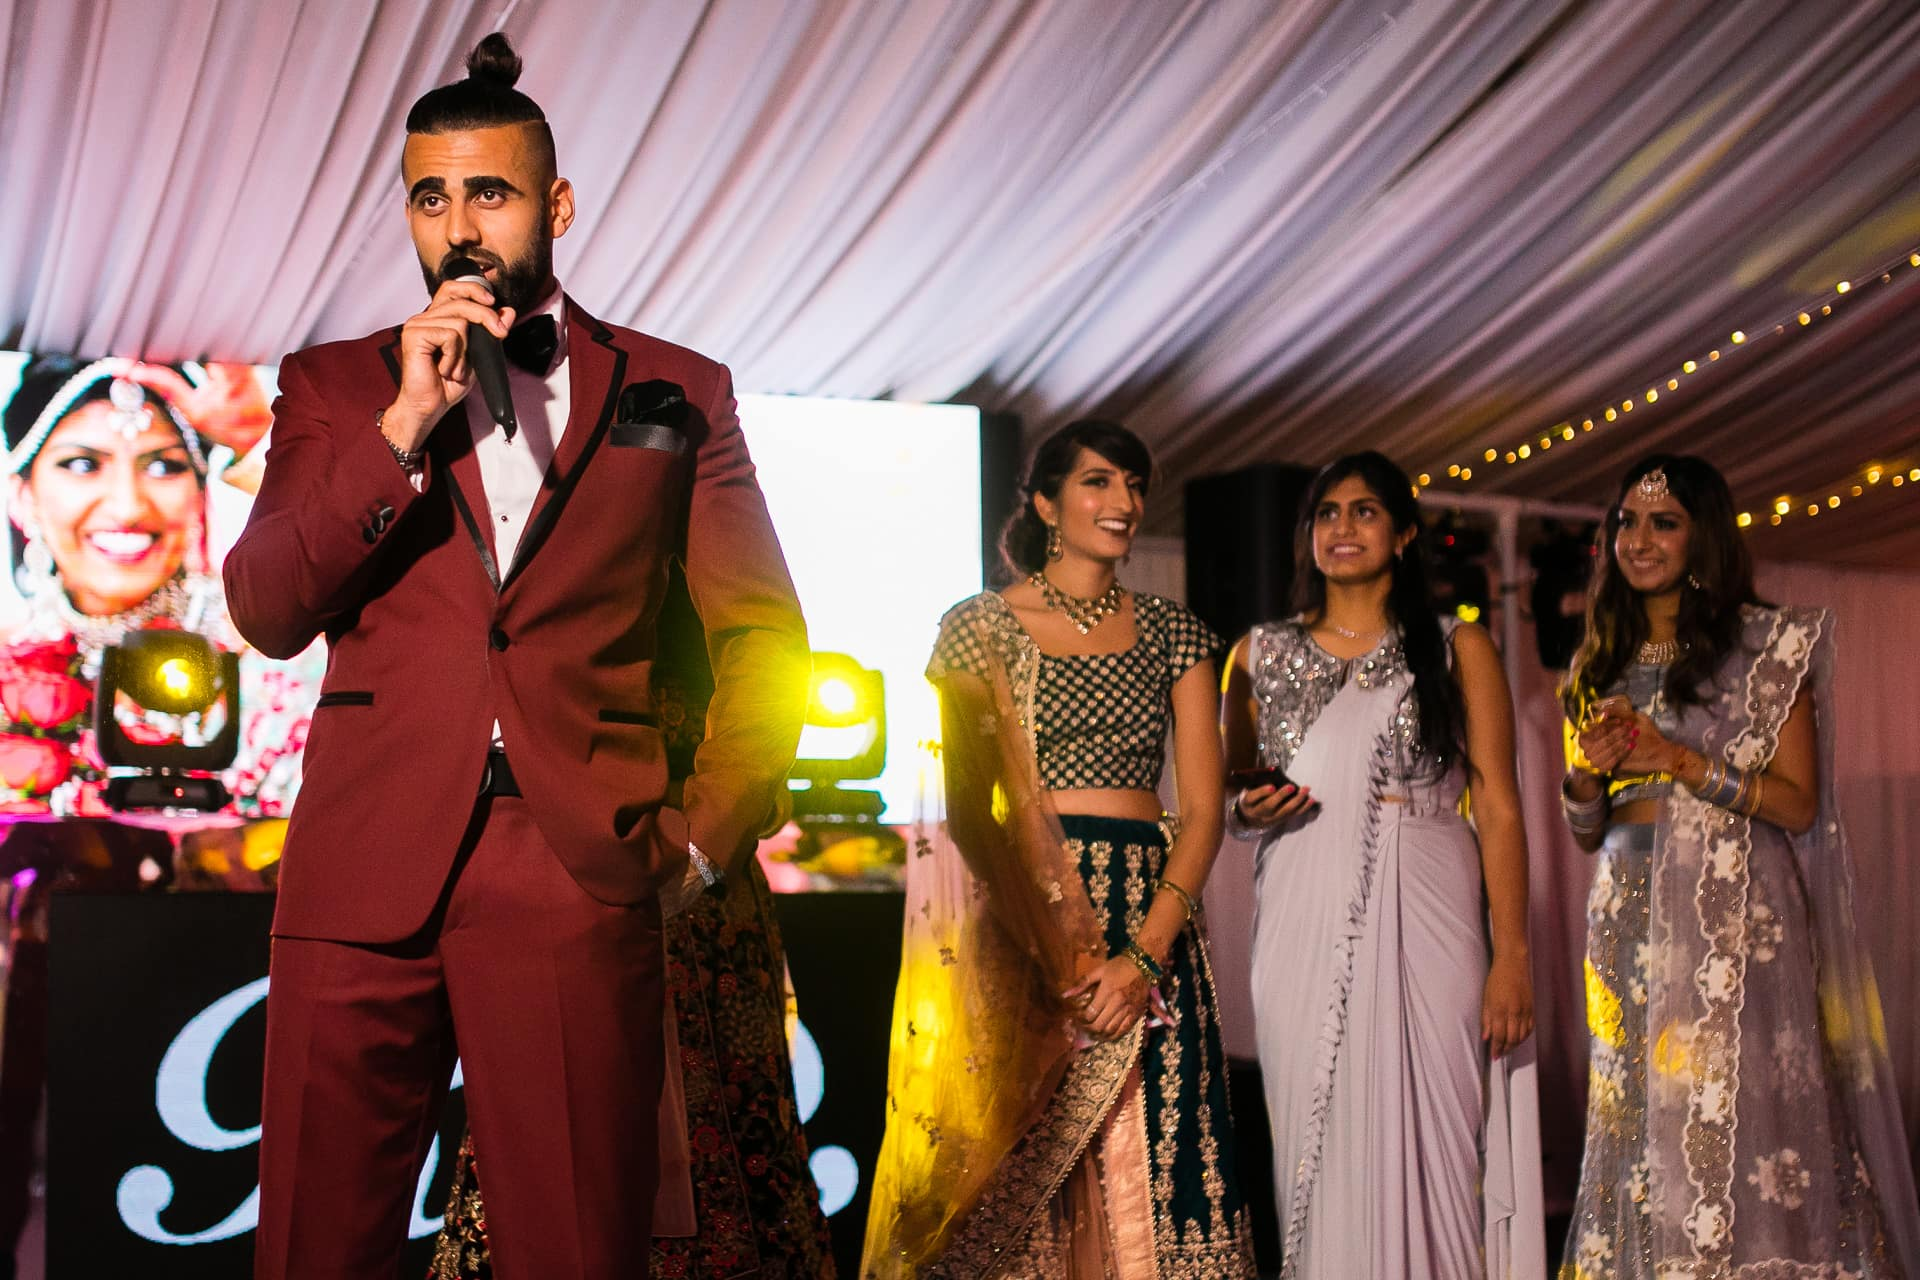 Bride's brother's speech